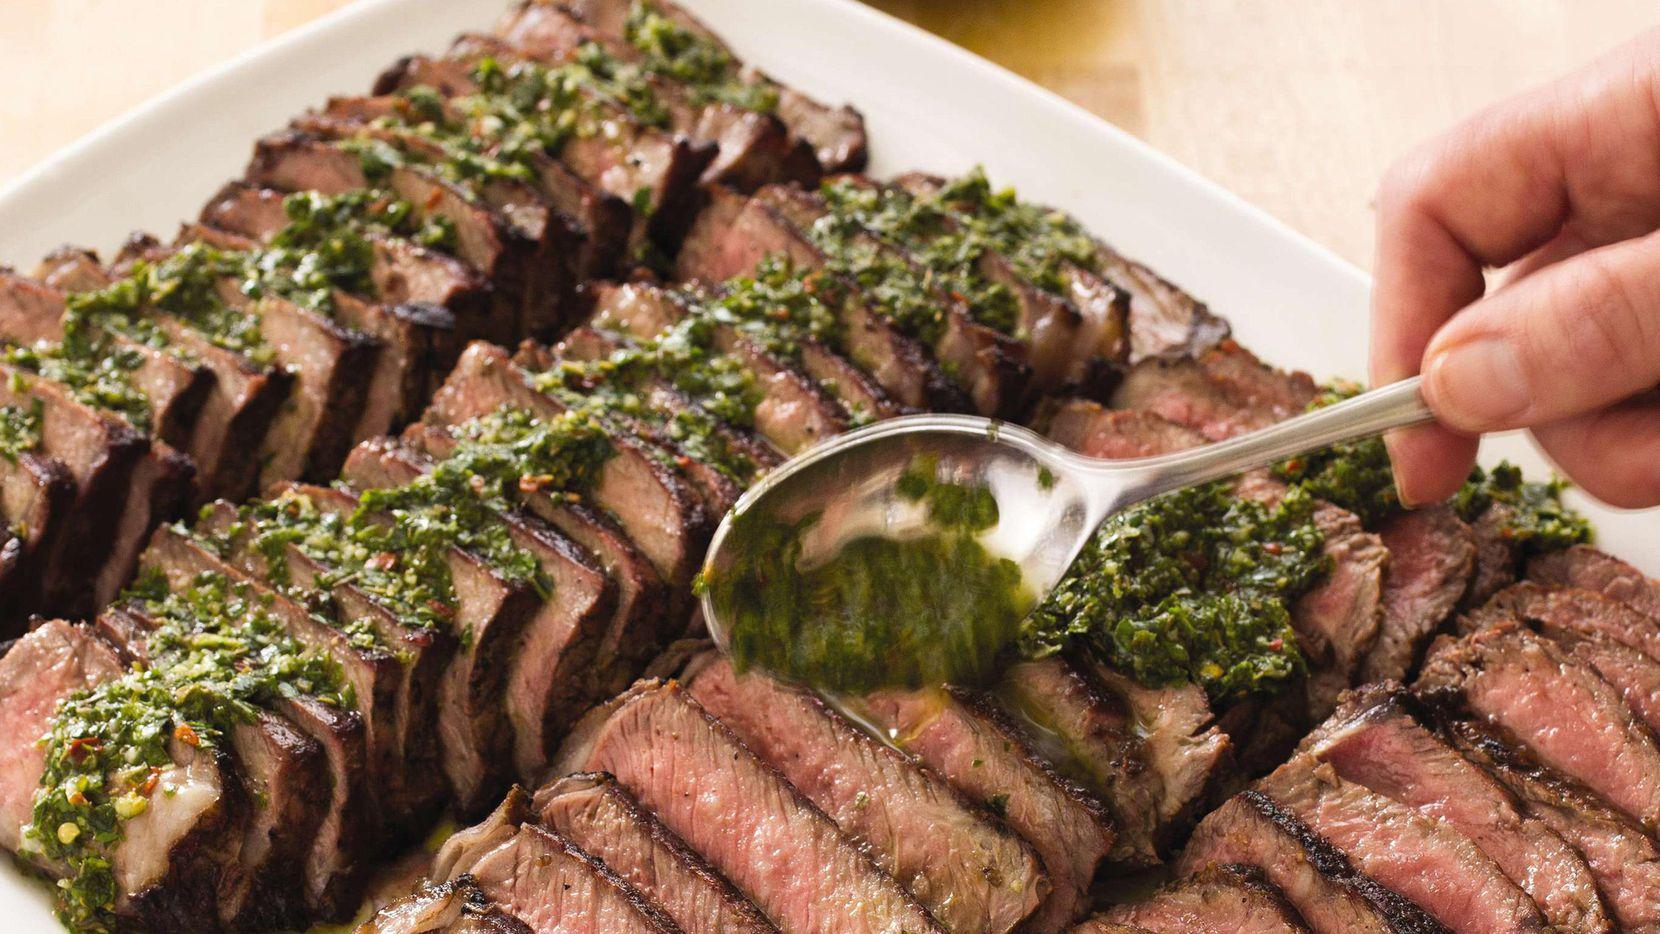 Filetes argentinos con salsa de chimichurri (AP/CARL TREMBLAY)